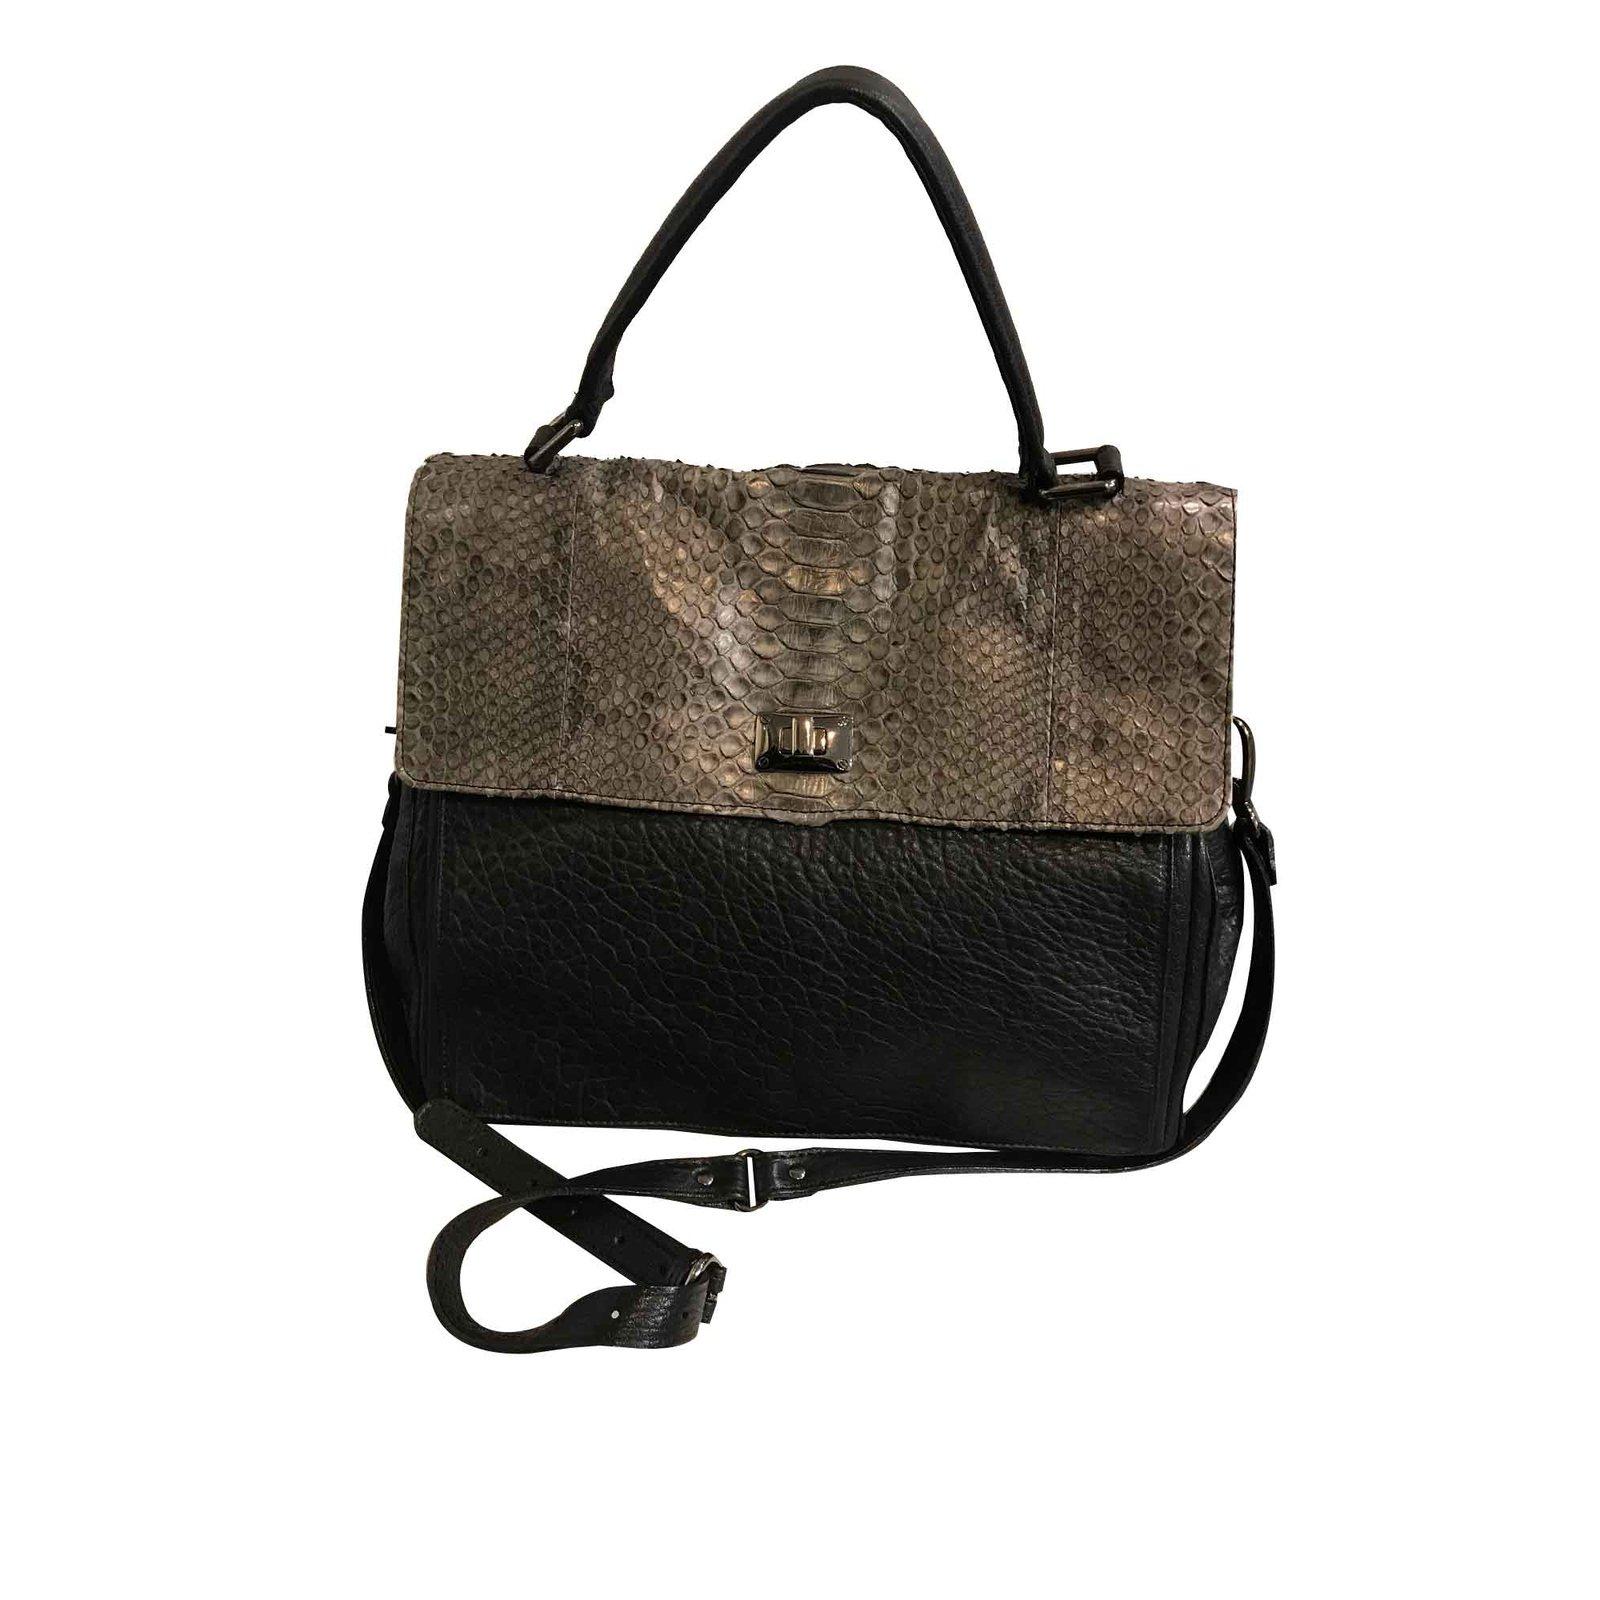 51eab7cdad80 Abaco LOU Handbags Leather Black ref.100560 - Joli Closet